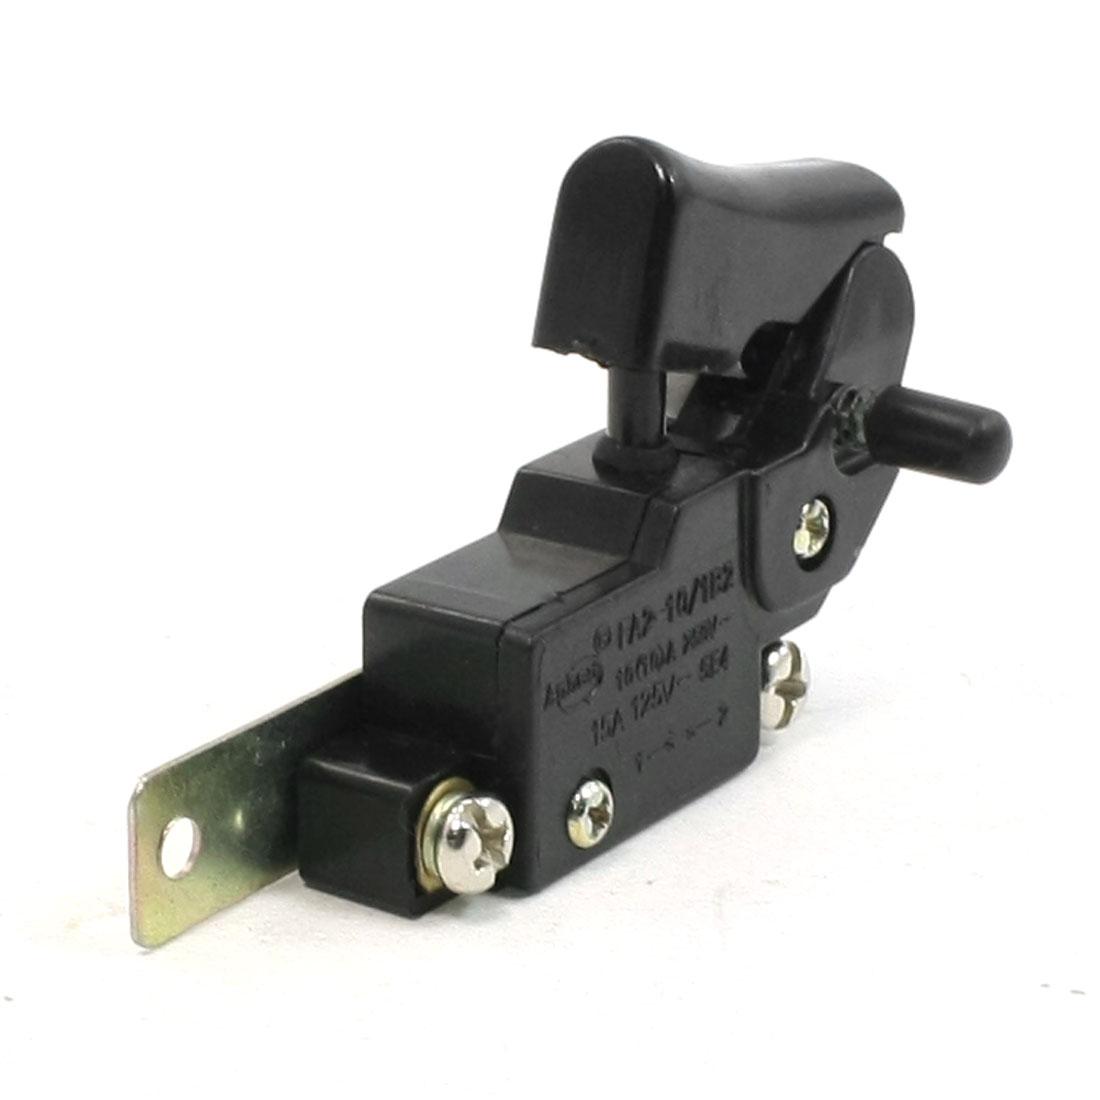 Cut off Machine Trigger Switch SPST AC 250V/10A 125V/15A for Hitachi CC14